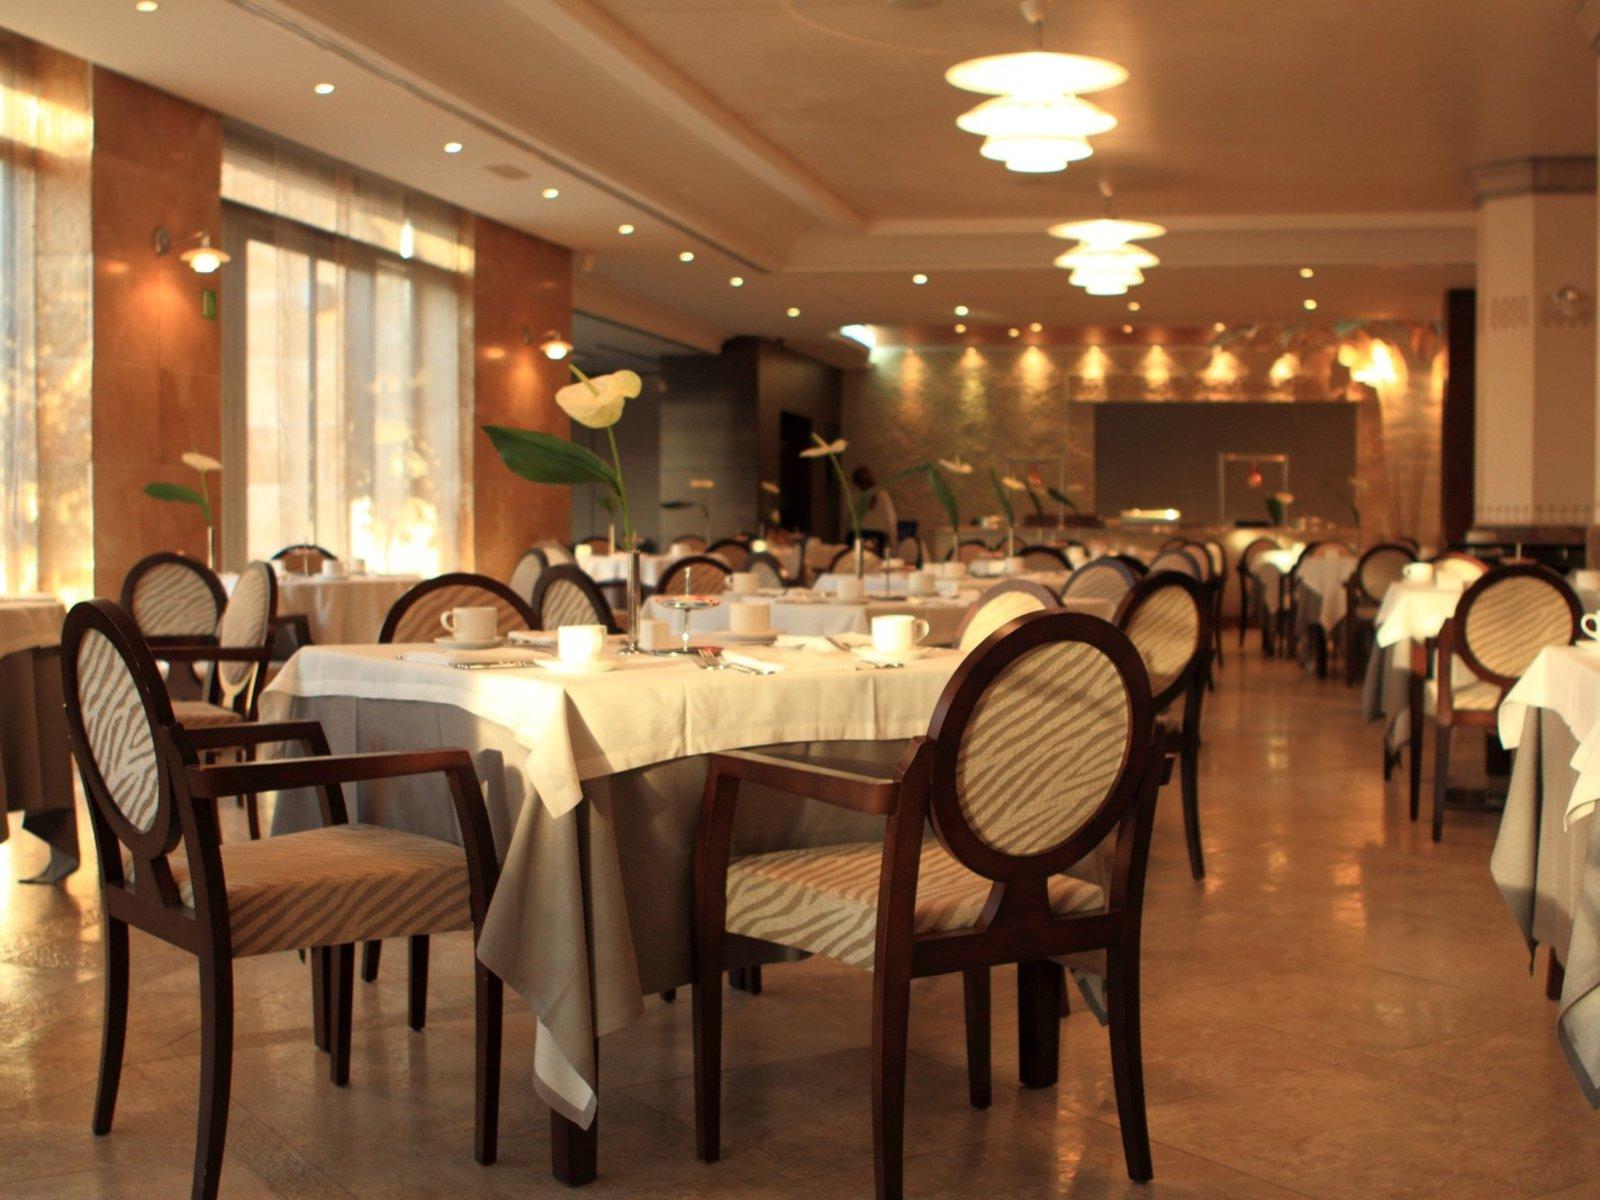 La Vinoteca Gourmet Restaurant